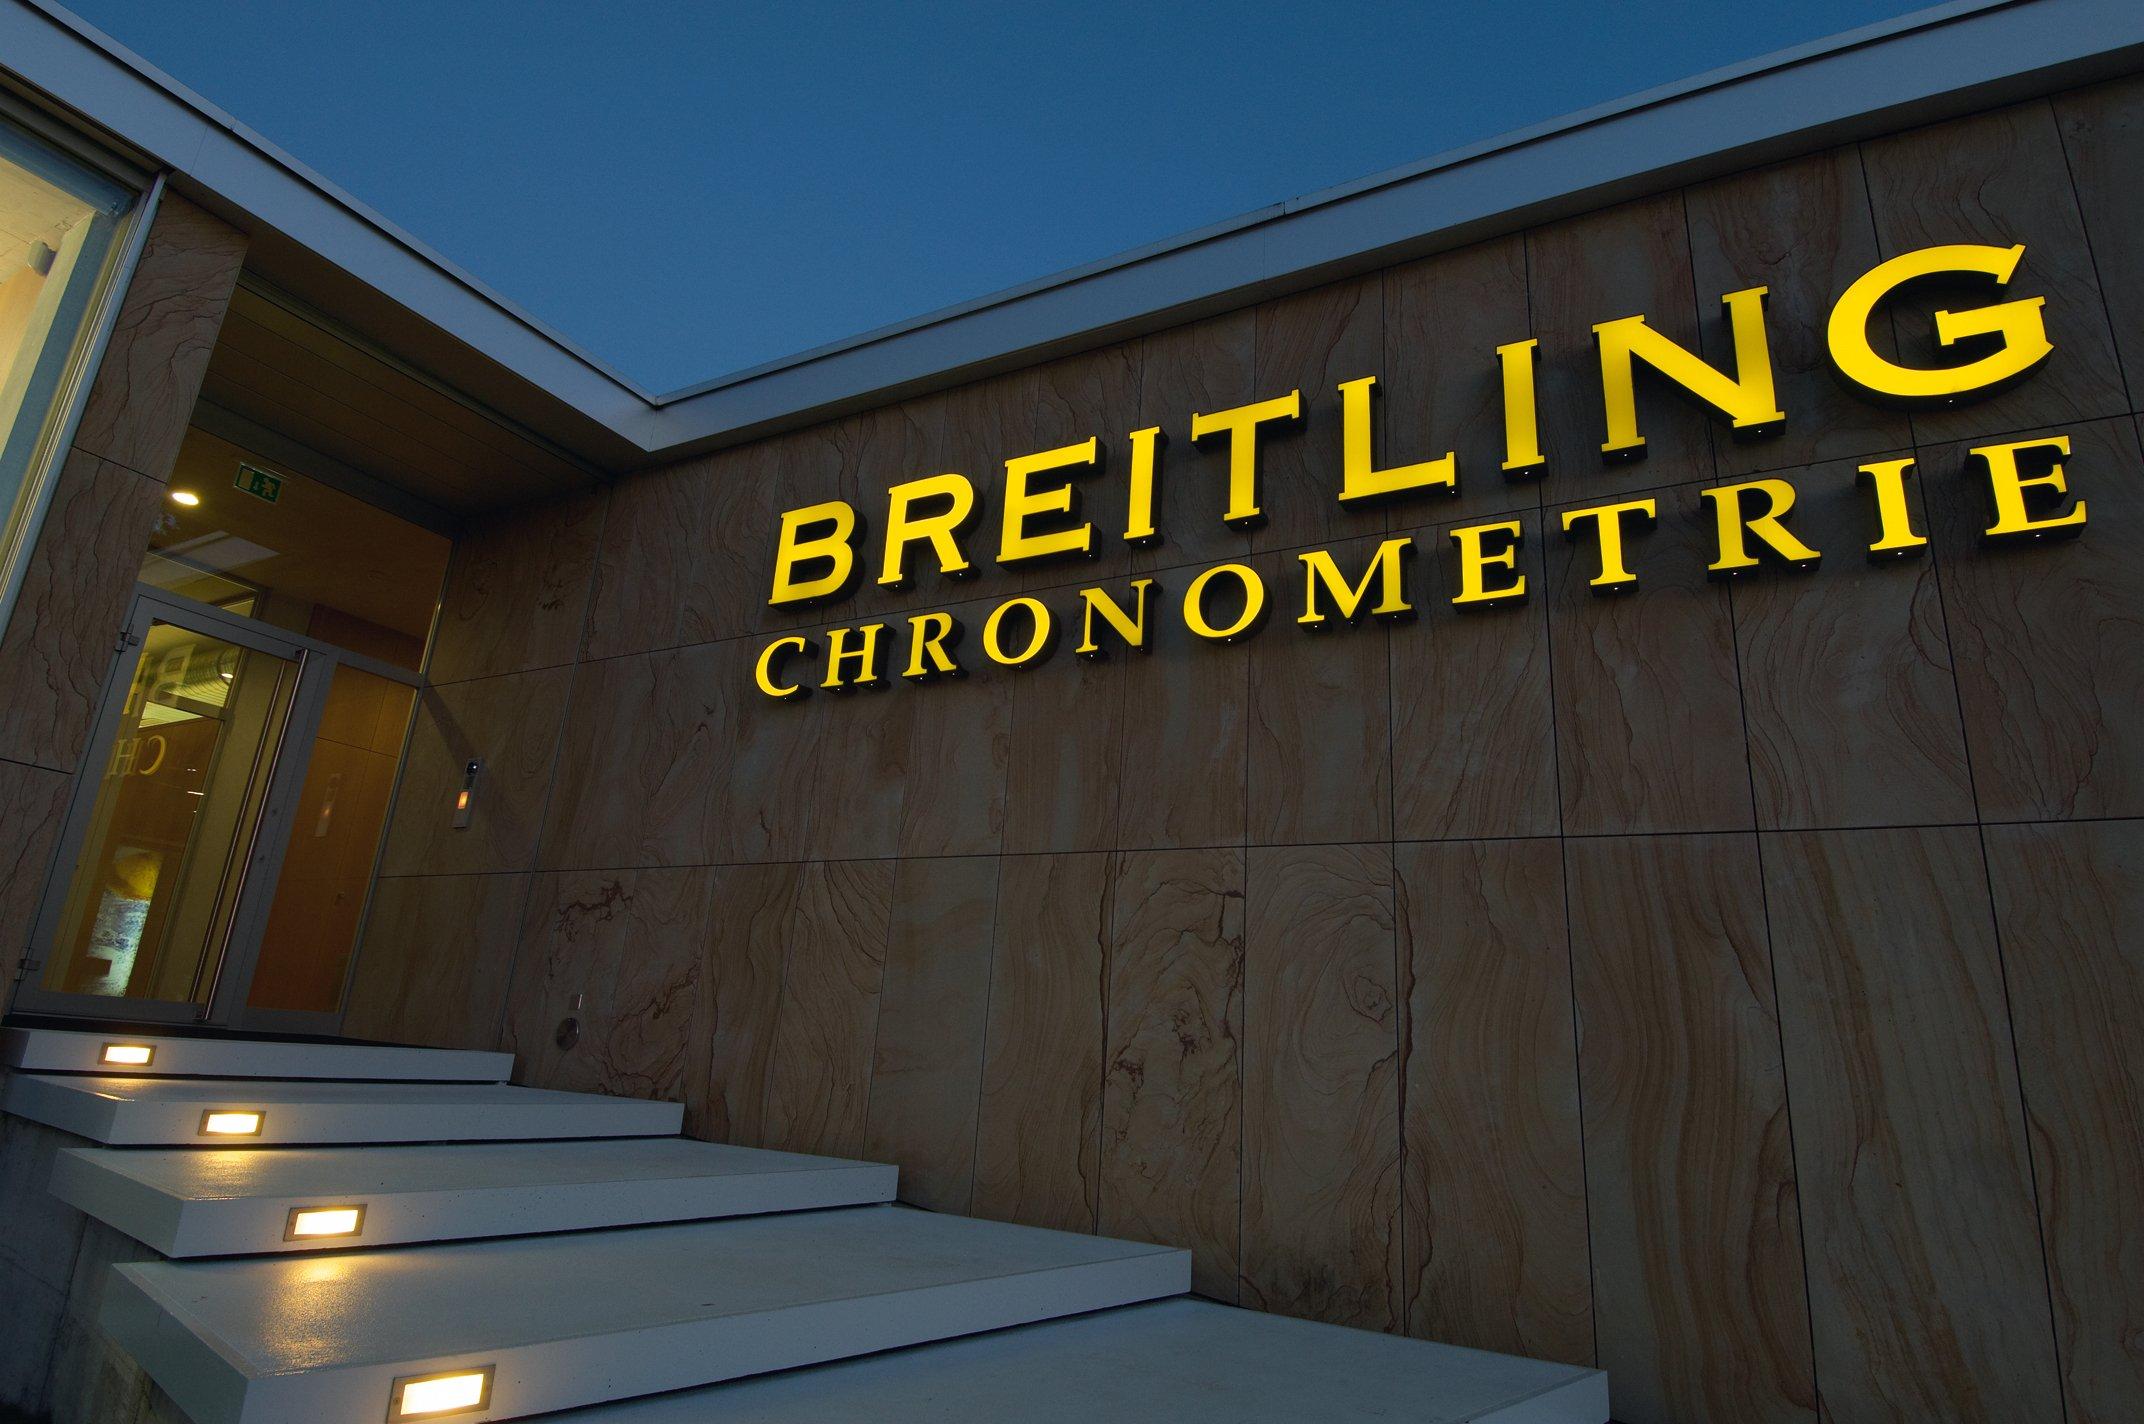 Breitling Chronométrie